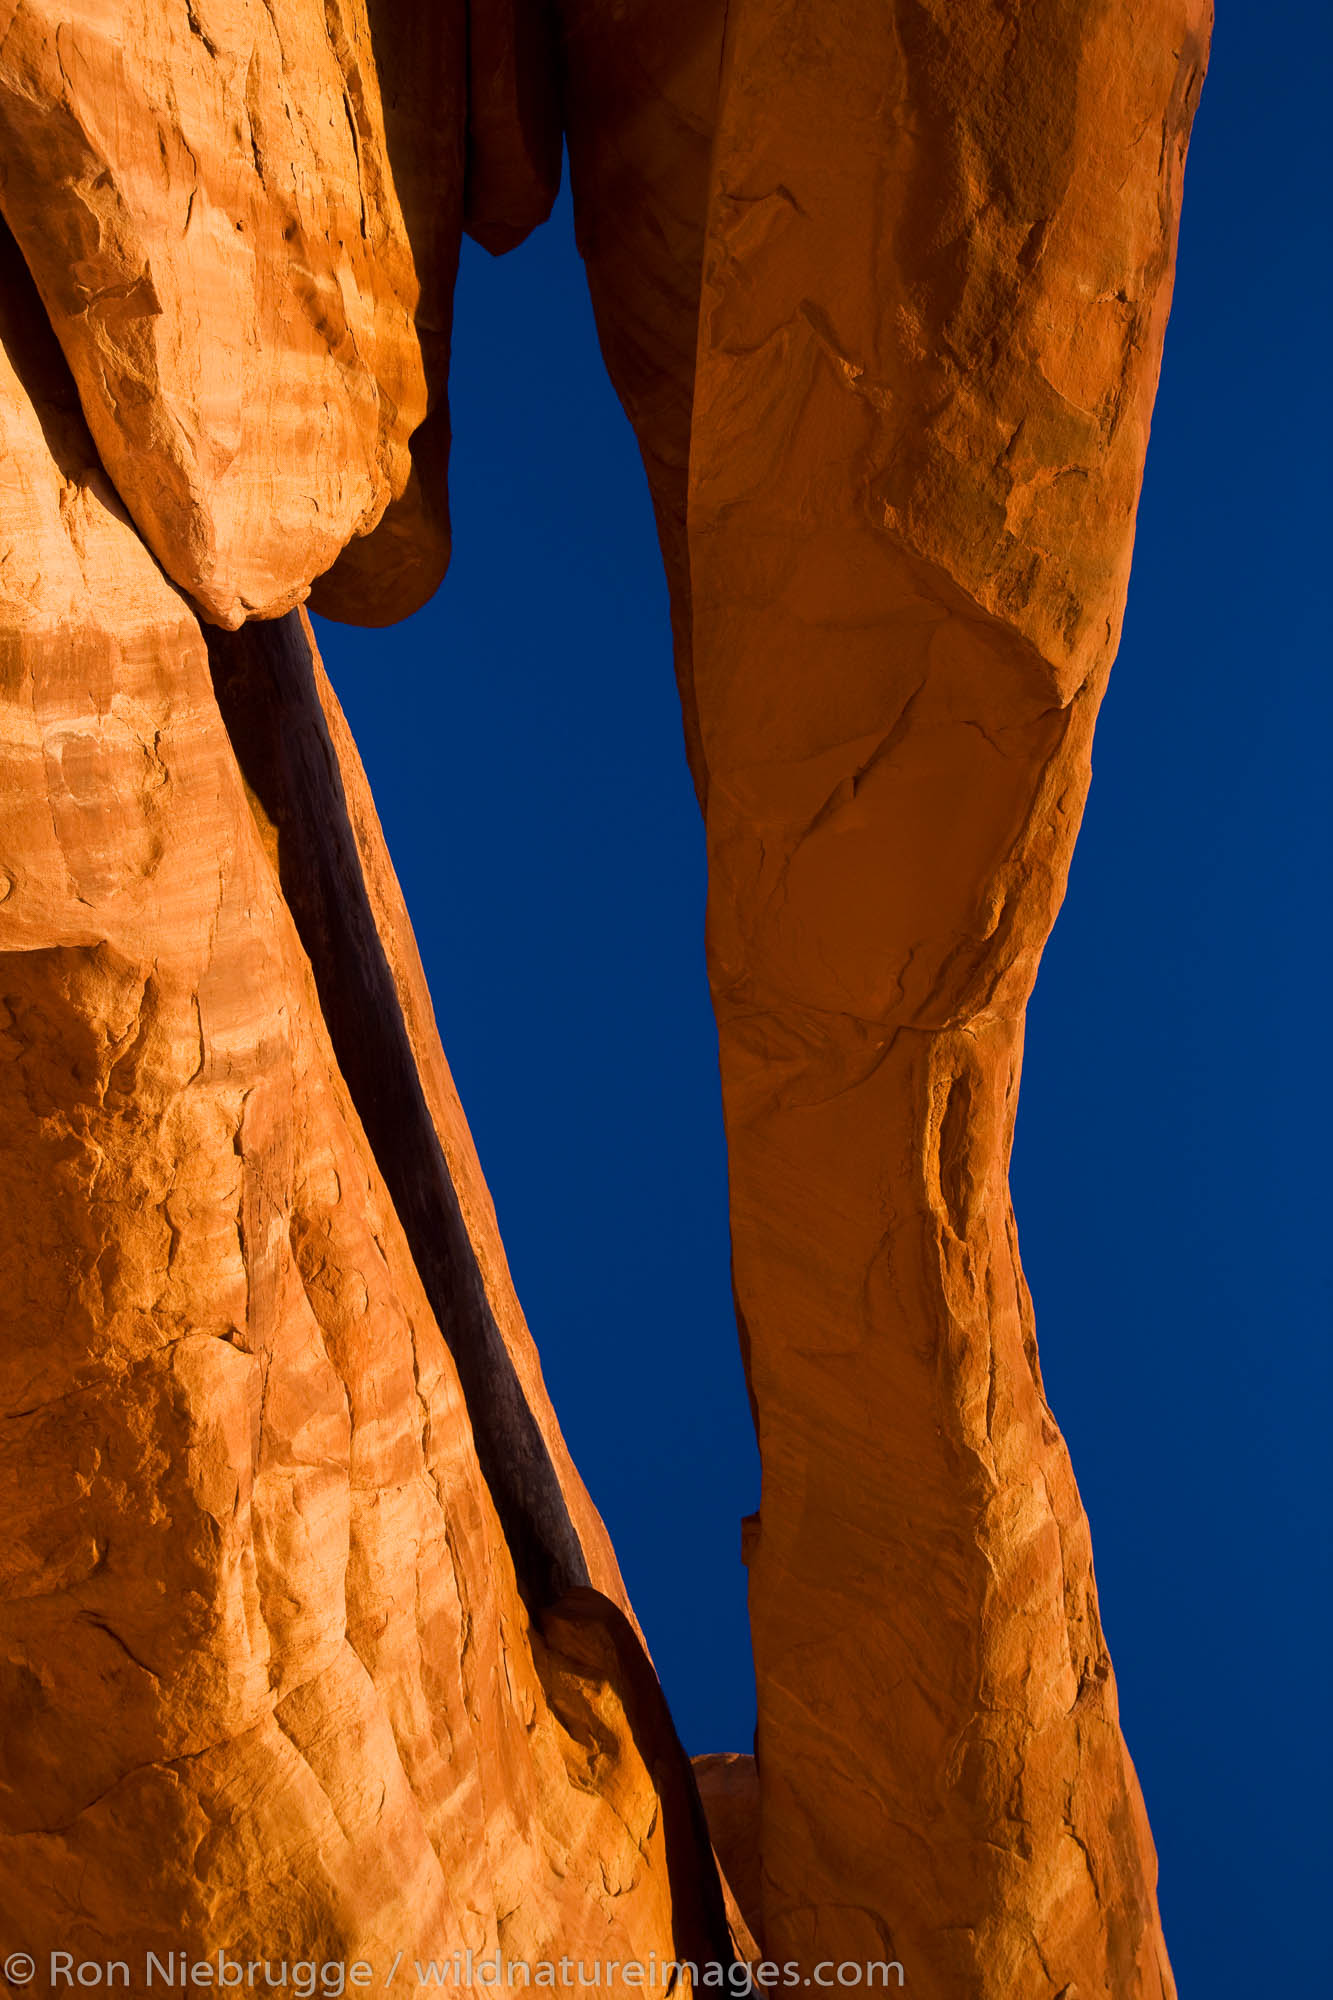 An unnammed arch, Klondike Bluffs area, Arches National Park, near Moab, Utah.